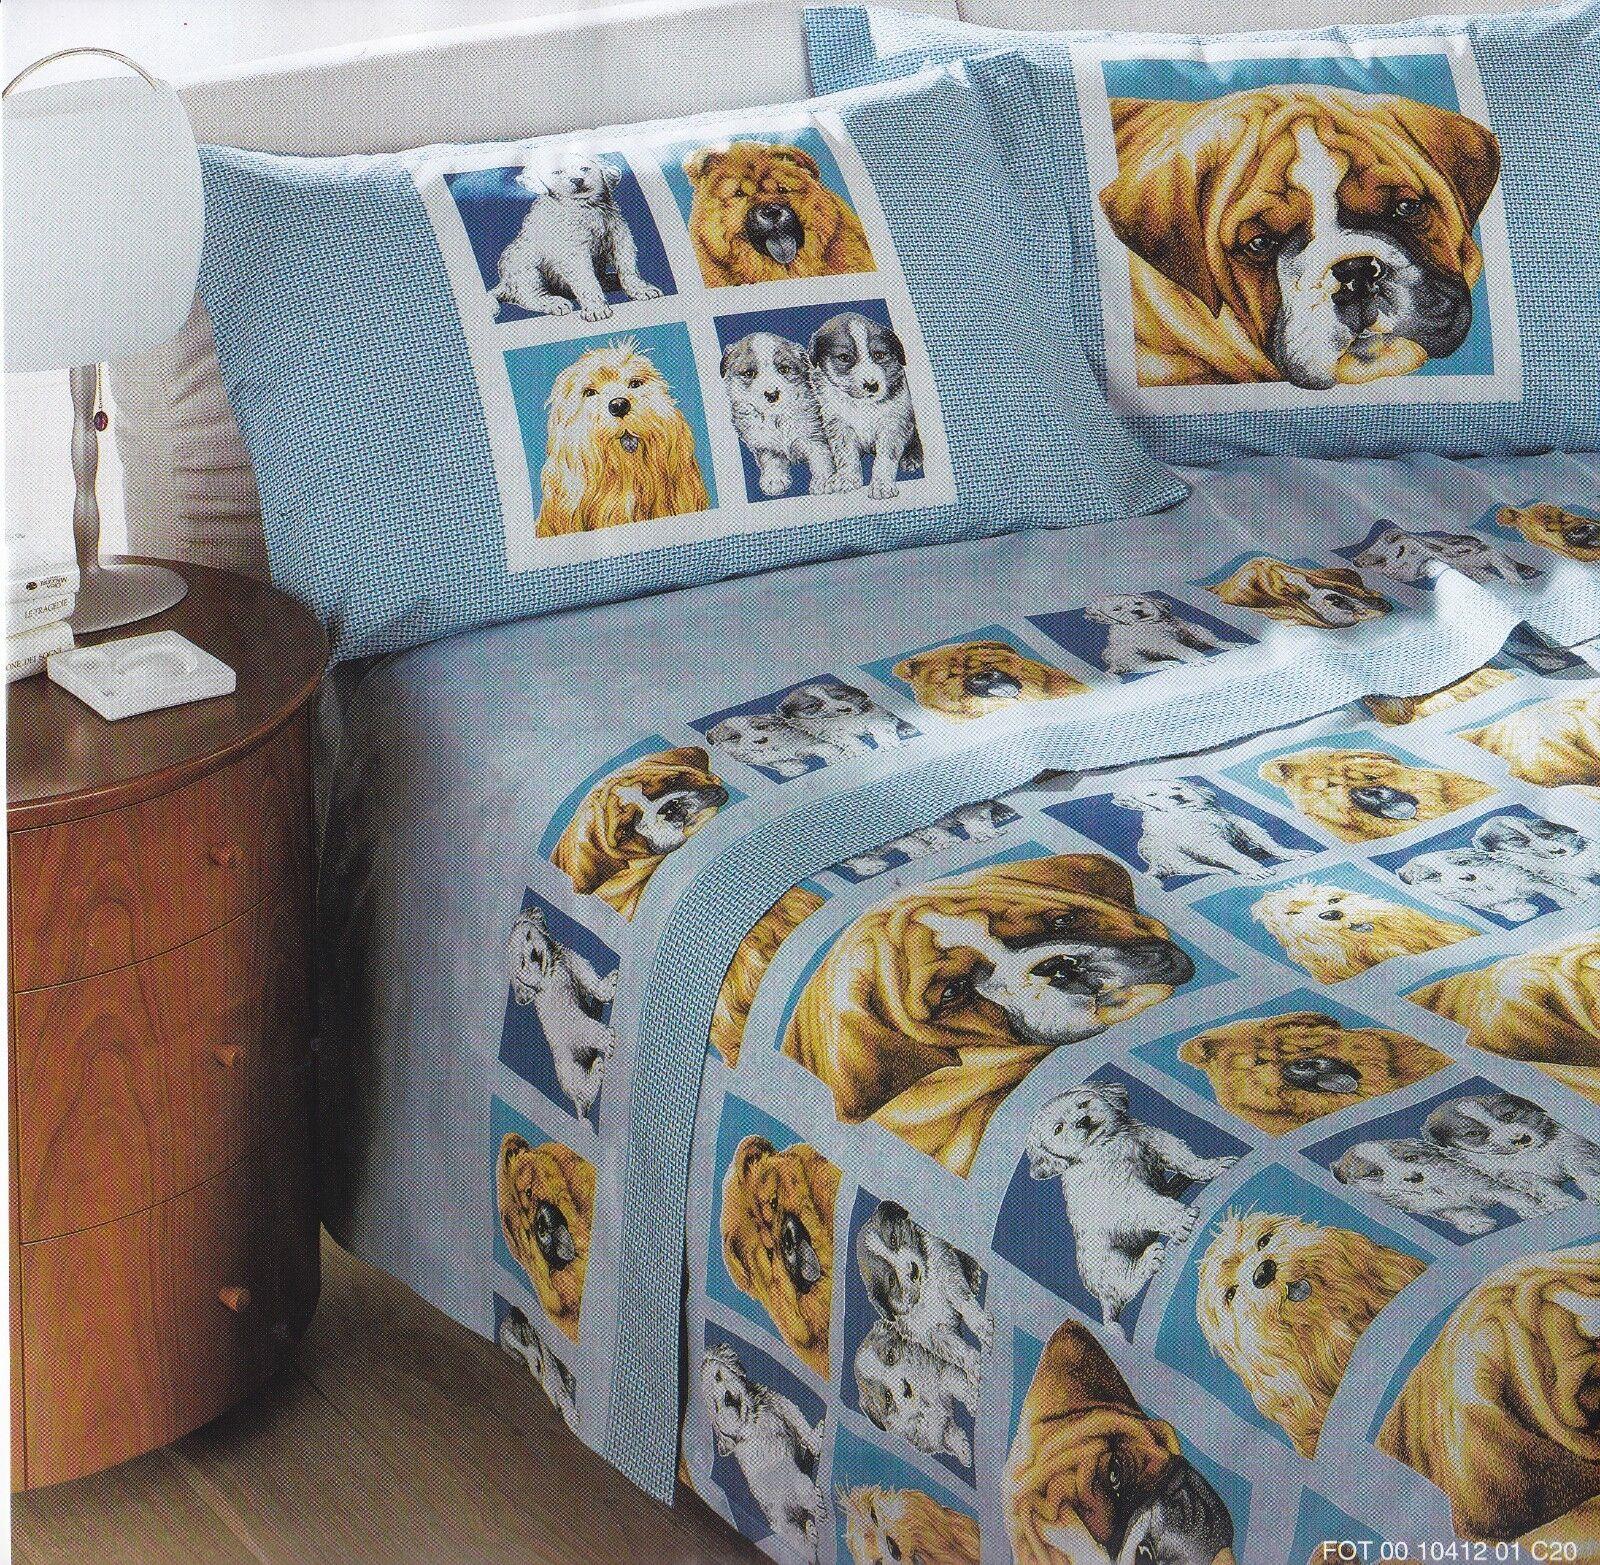 Completo letto, Lenzuola in Caldo Cotone GABEL CANI 10412 Matrimoniale, 2 Piazze